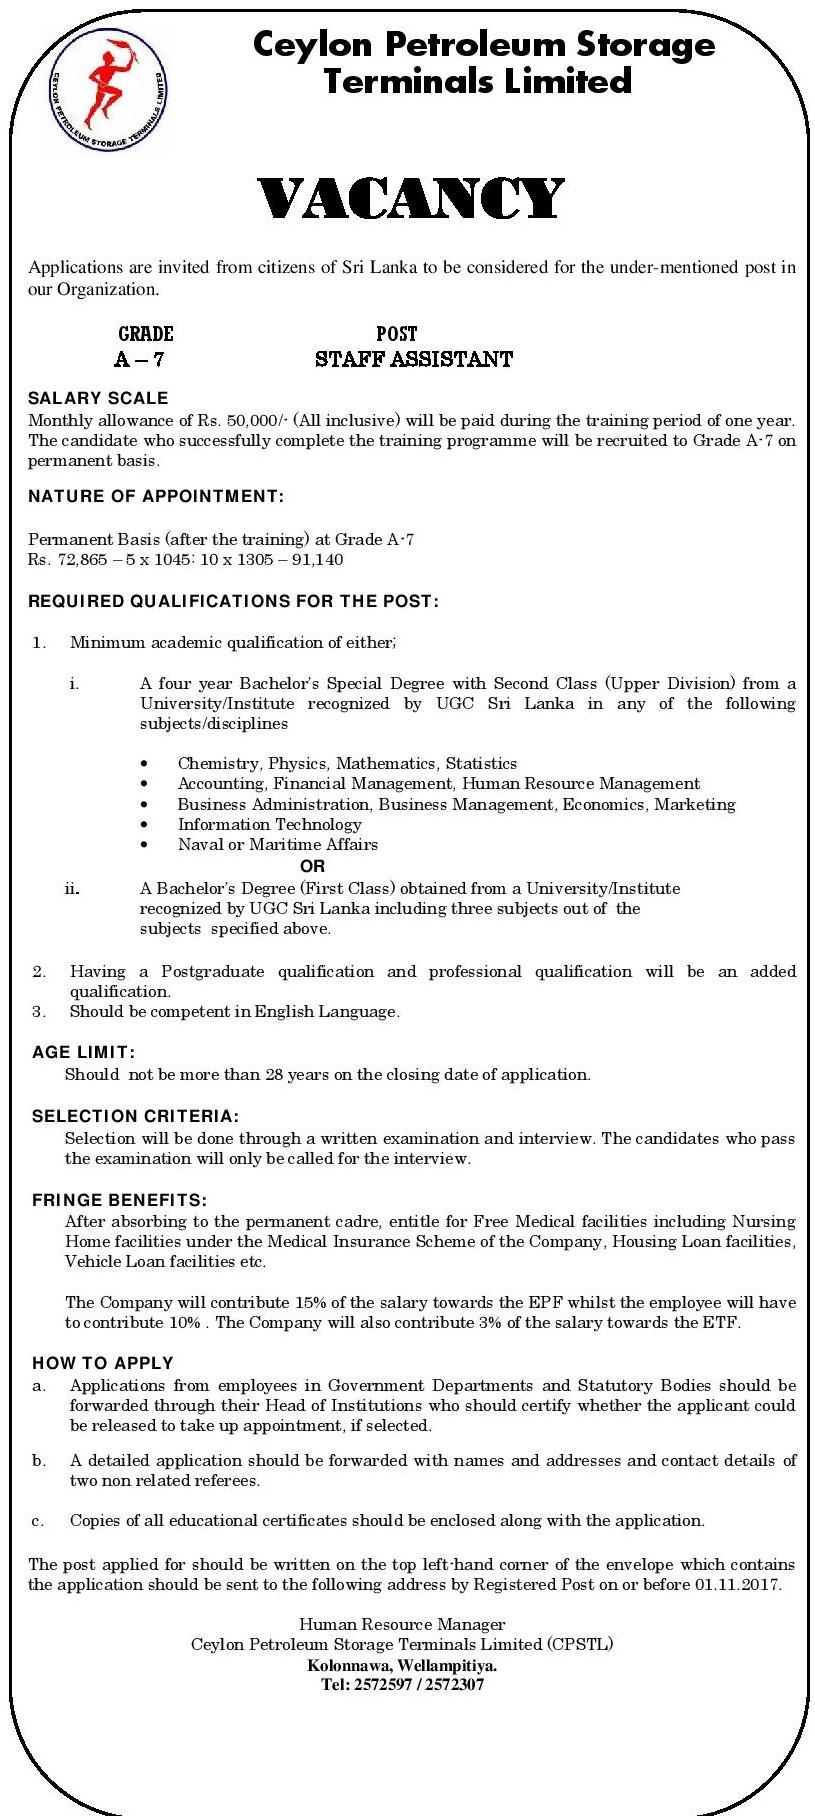 Staff Assistant - Ceylon Petroleum Storage Terminals Ltd